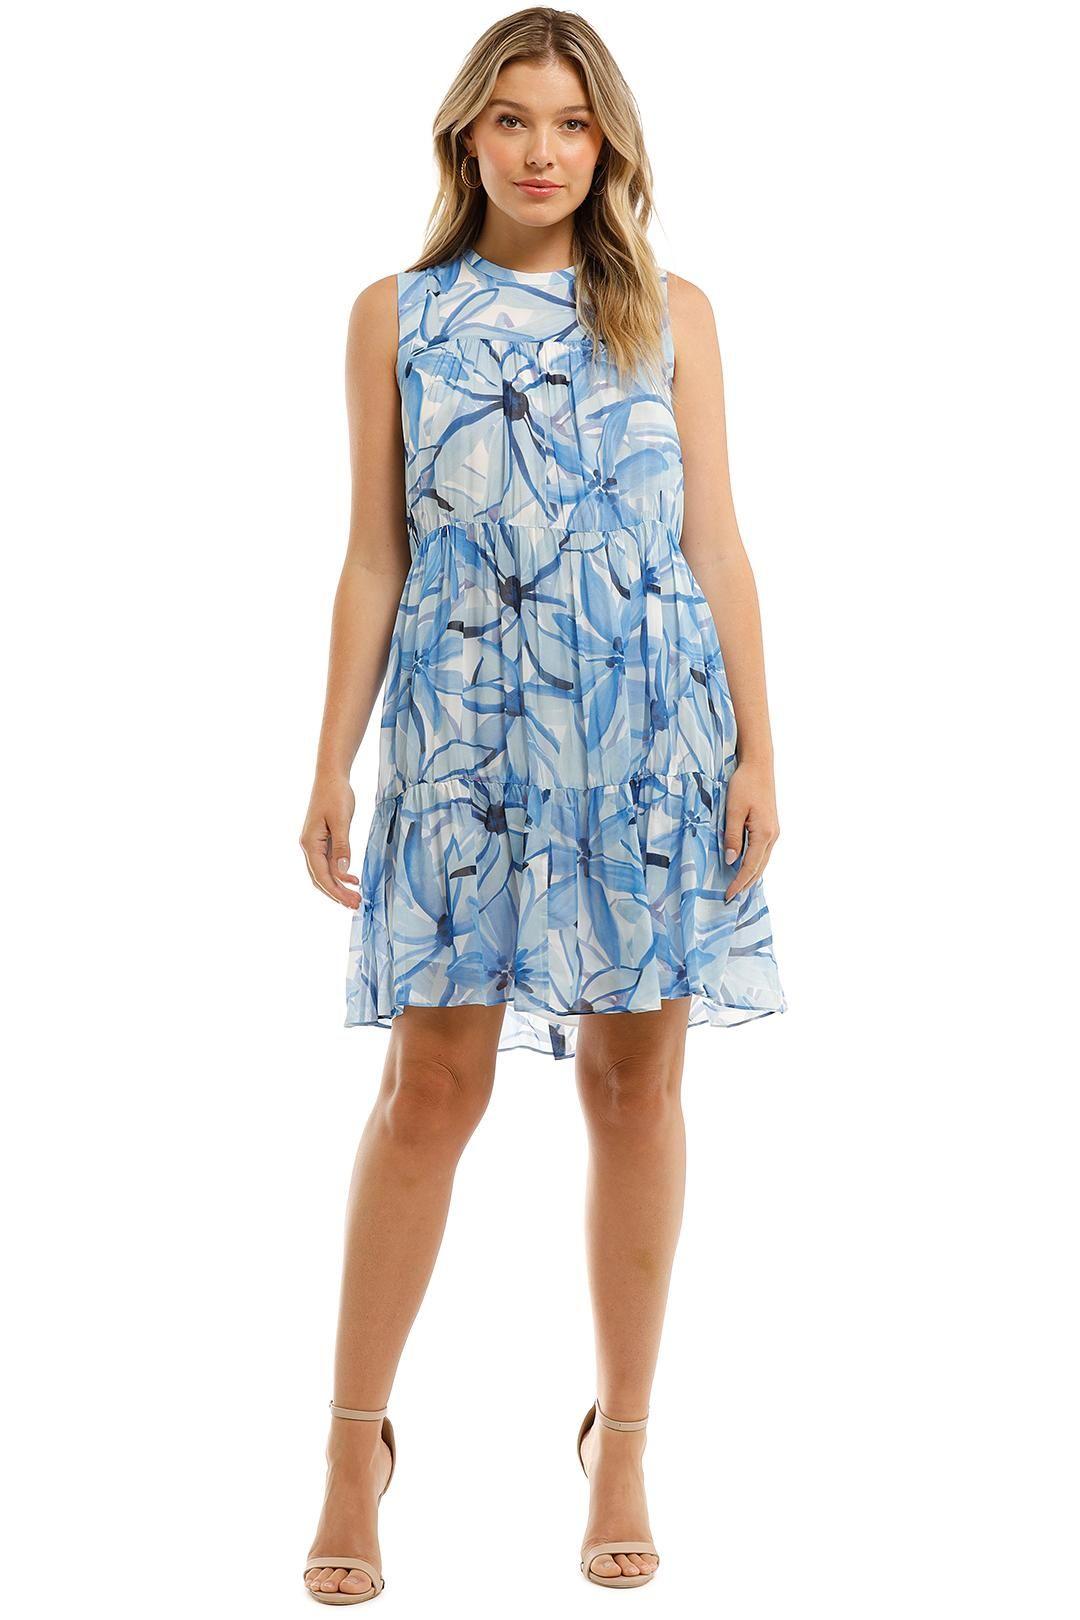 Witchery Sleeveless Tiered Dress Mini Blue Floral Crew